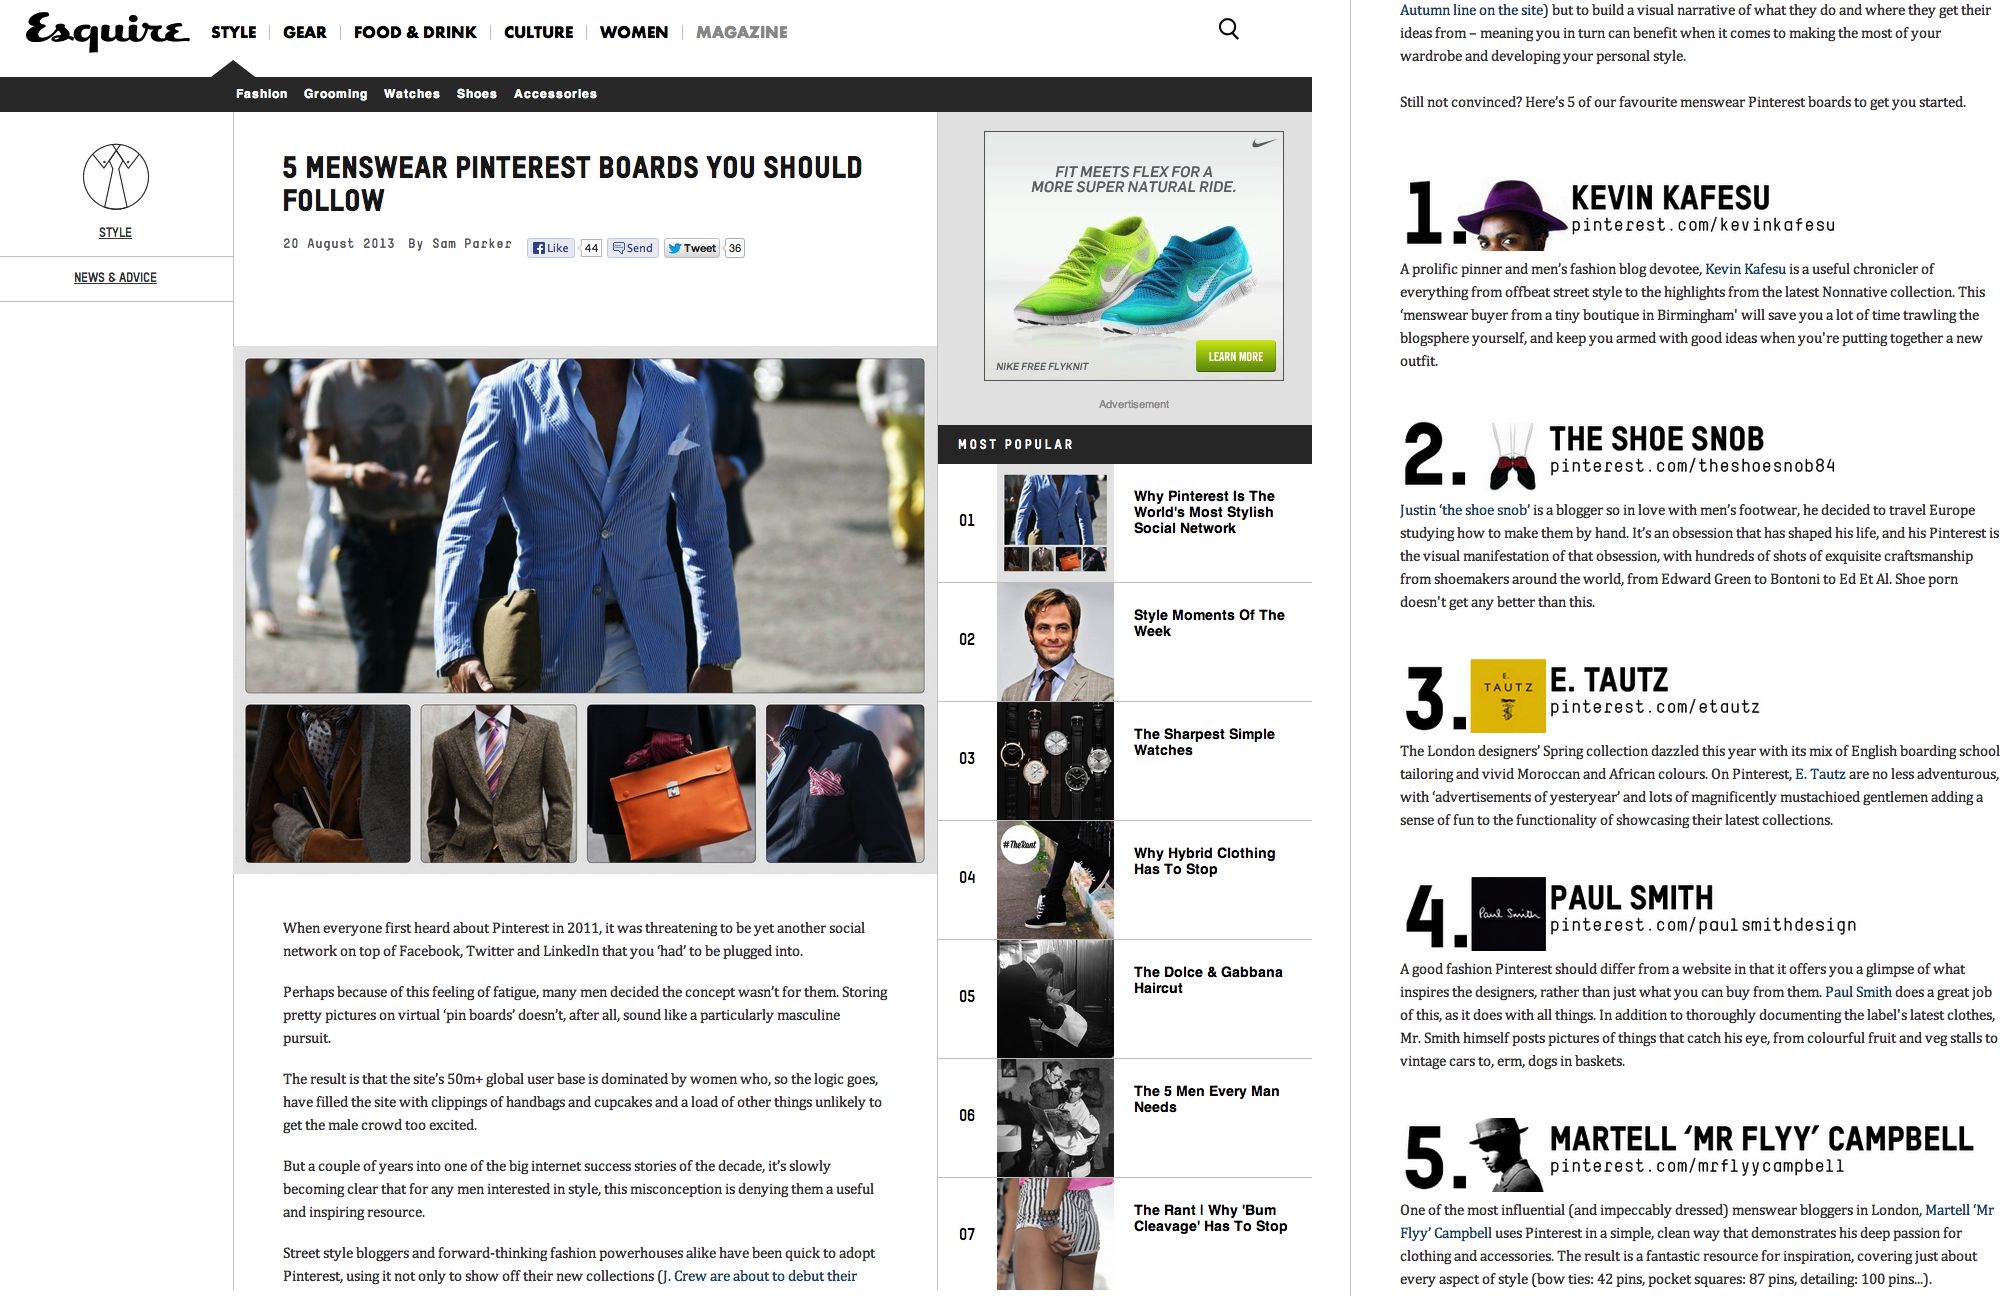 Esquire's Top 5 Pinterest Accounts